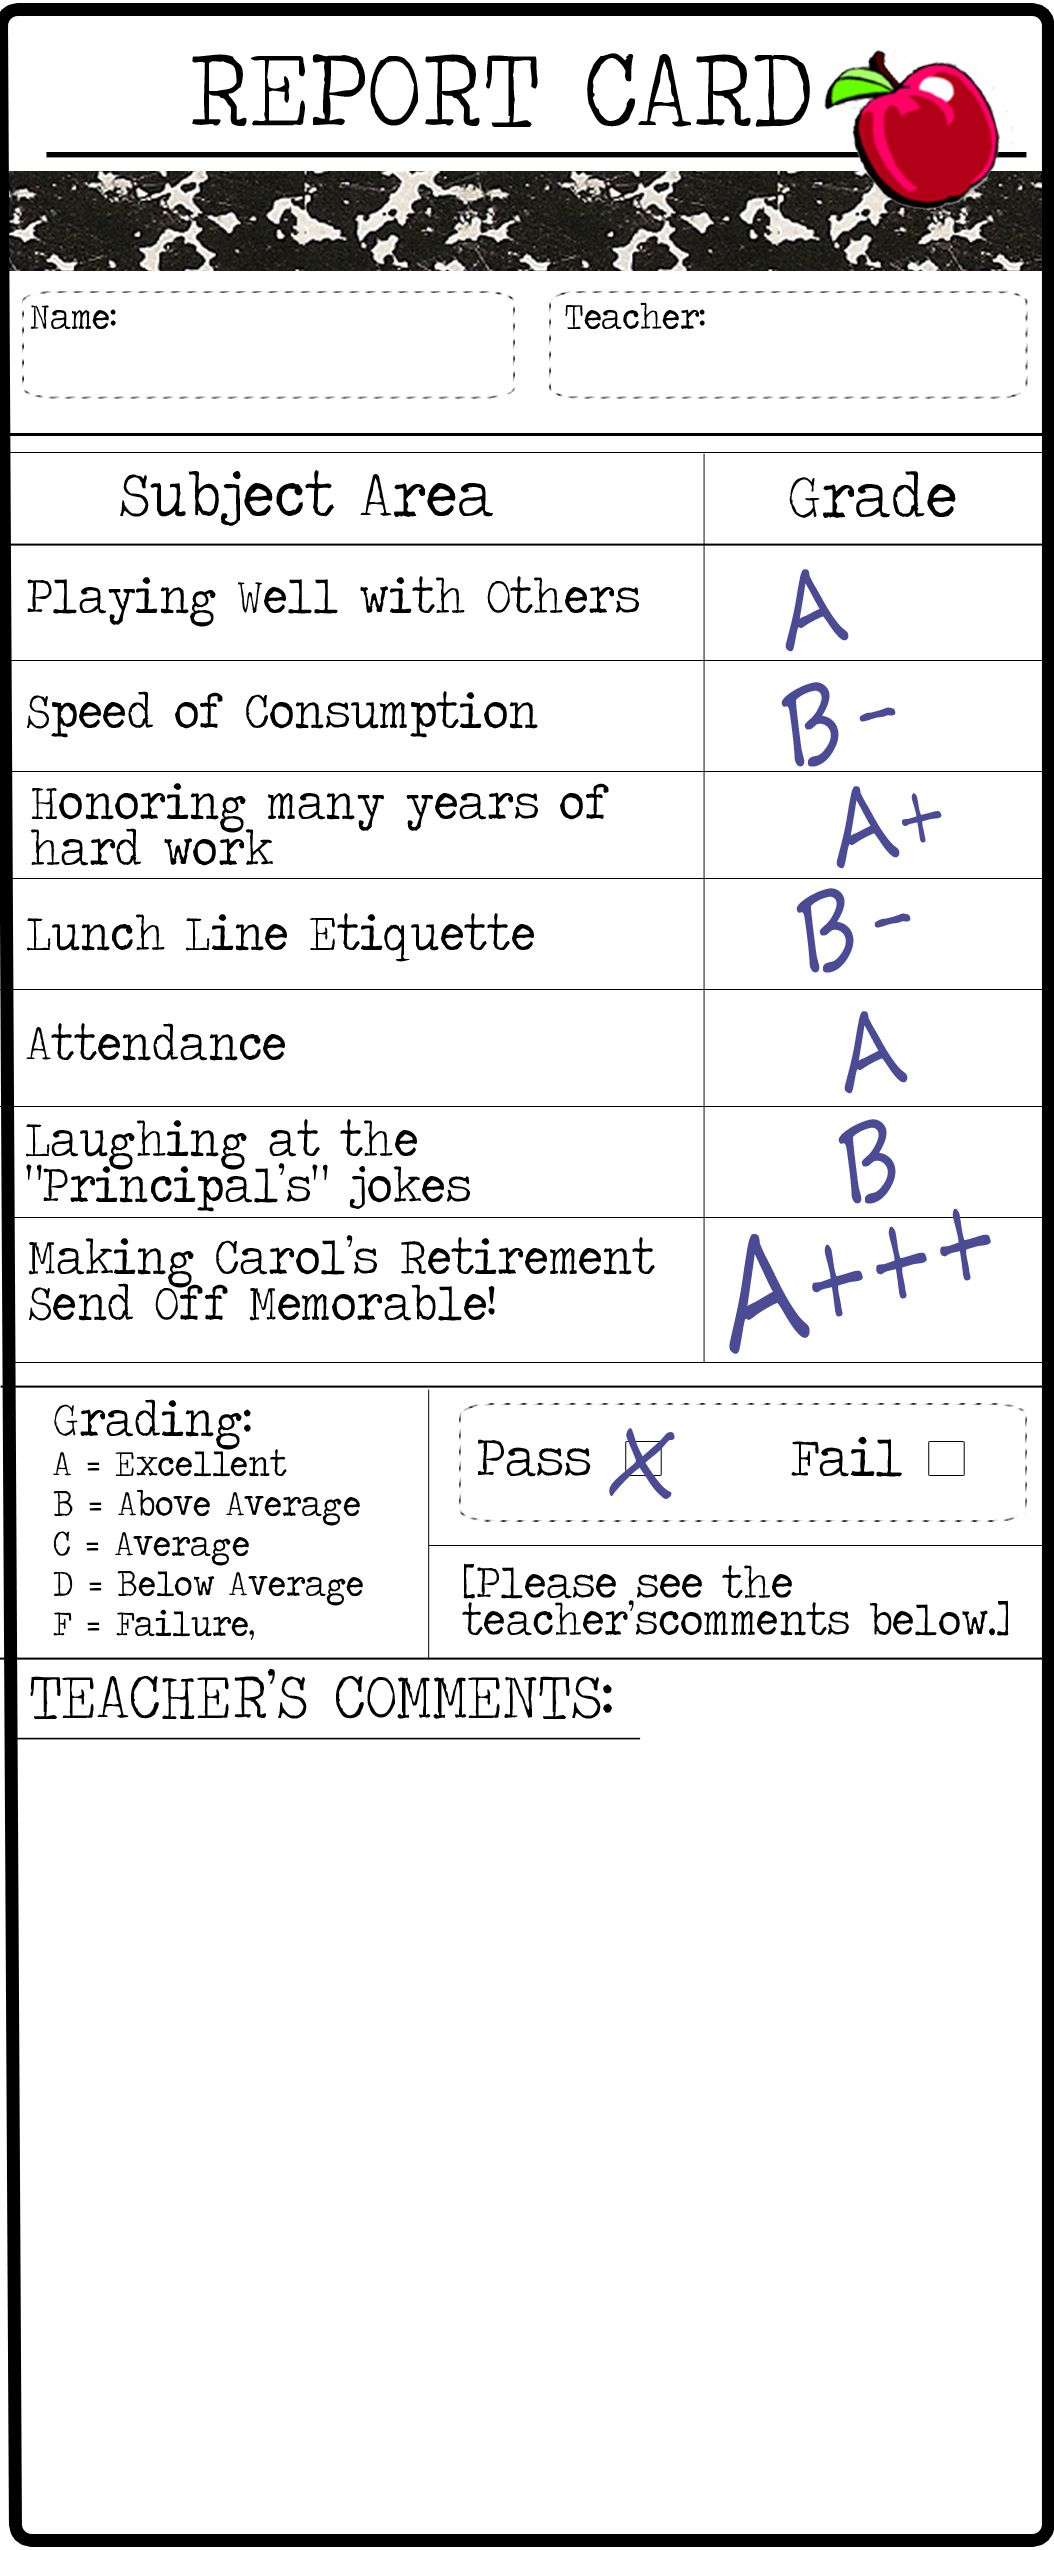 Teacher Retirement Thank You Note